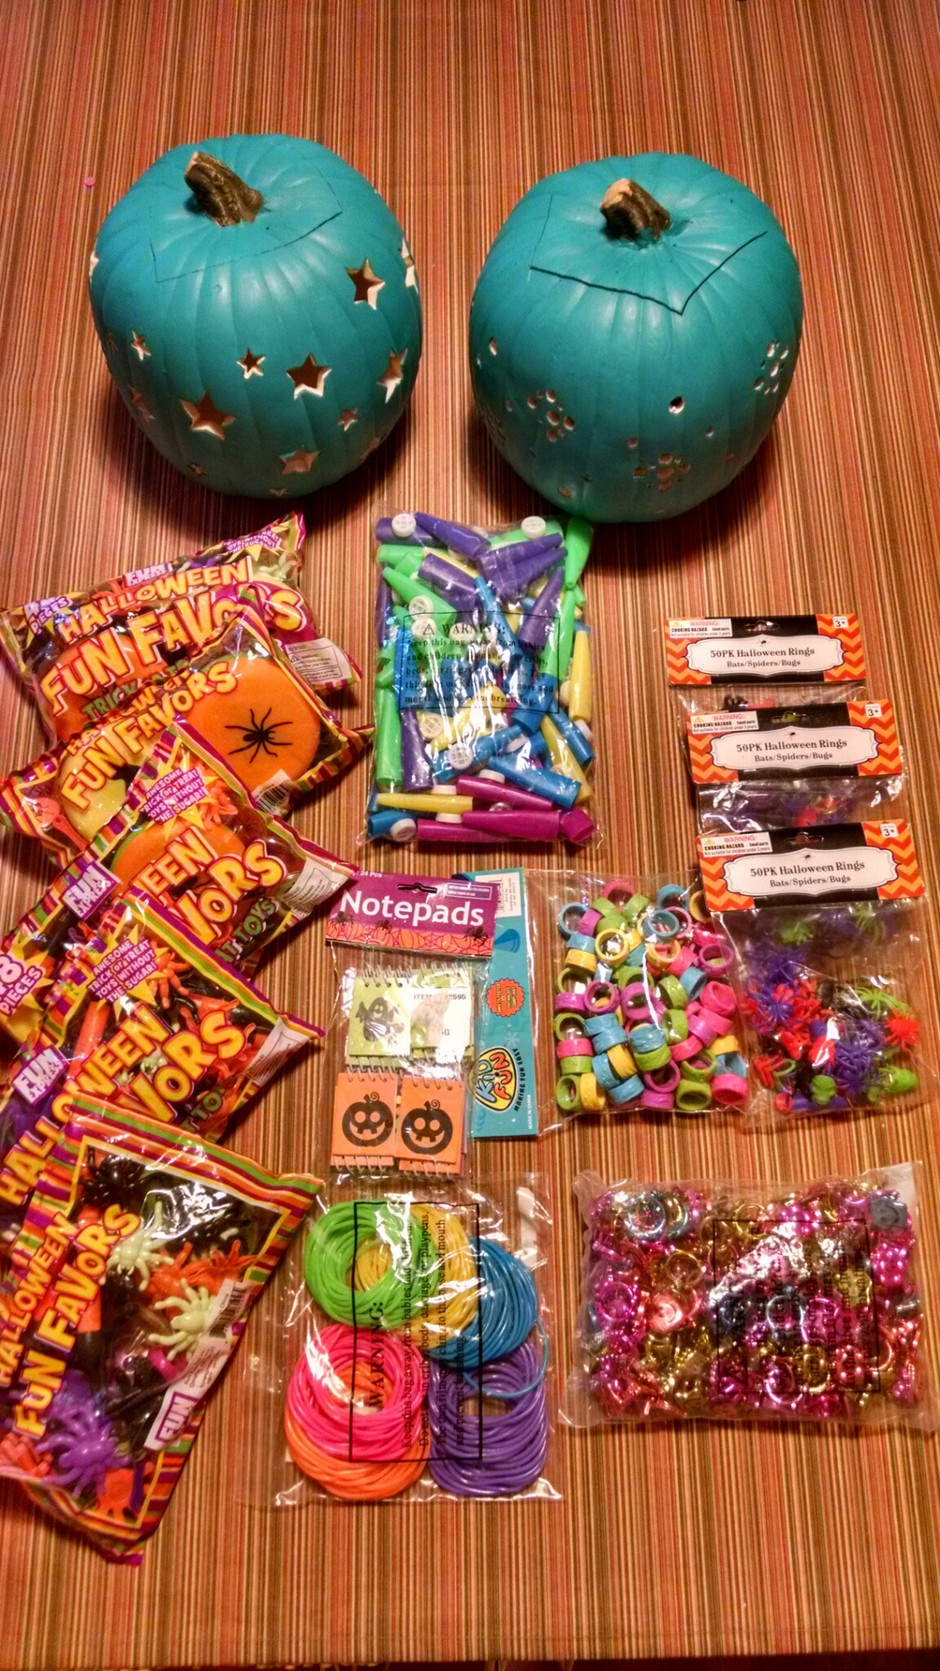 Why I'm a Bad Mom - I Don't Hand Out Candy on Halloween